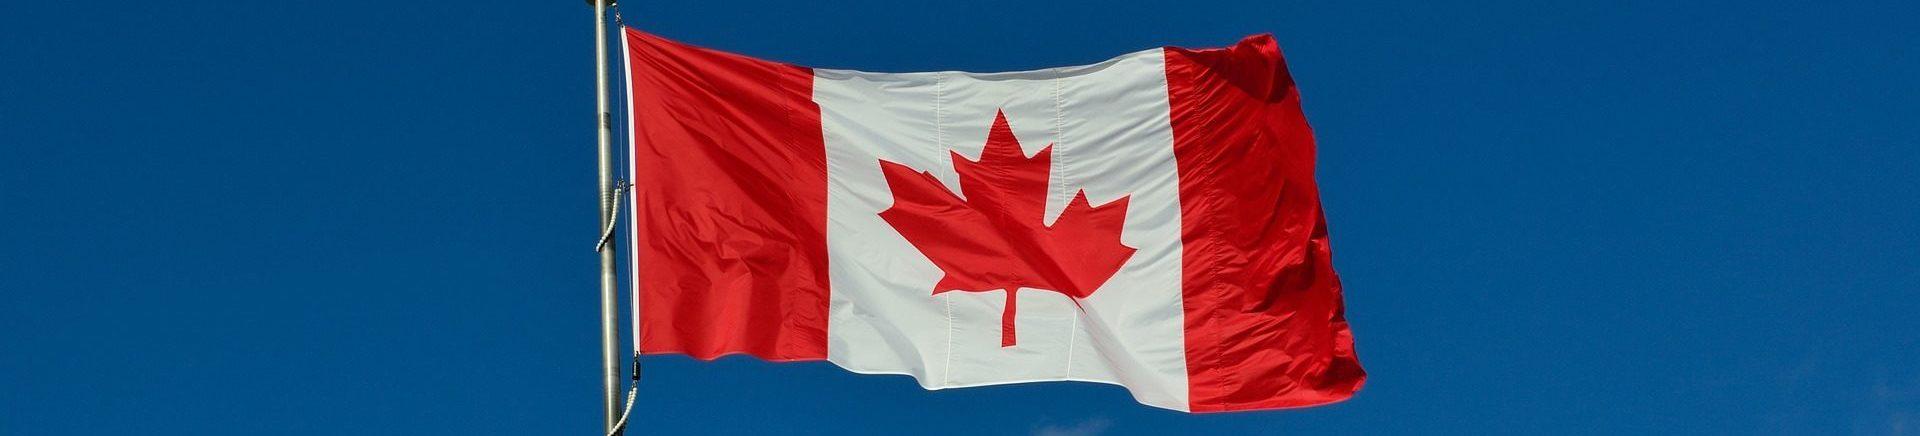 Canada Flag Waving on a pole